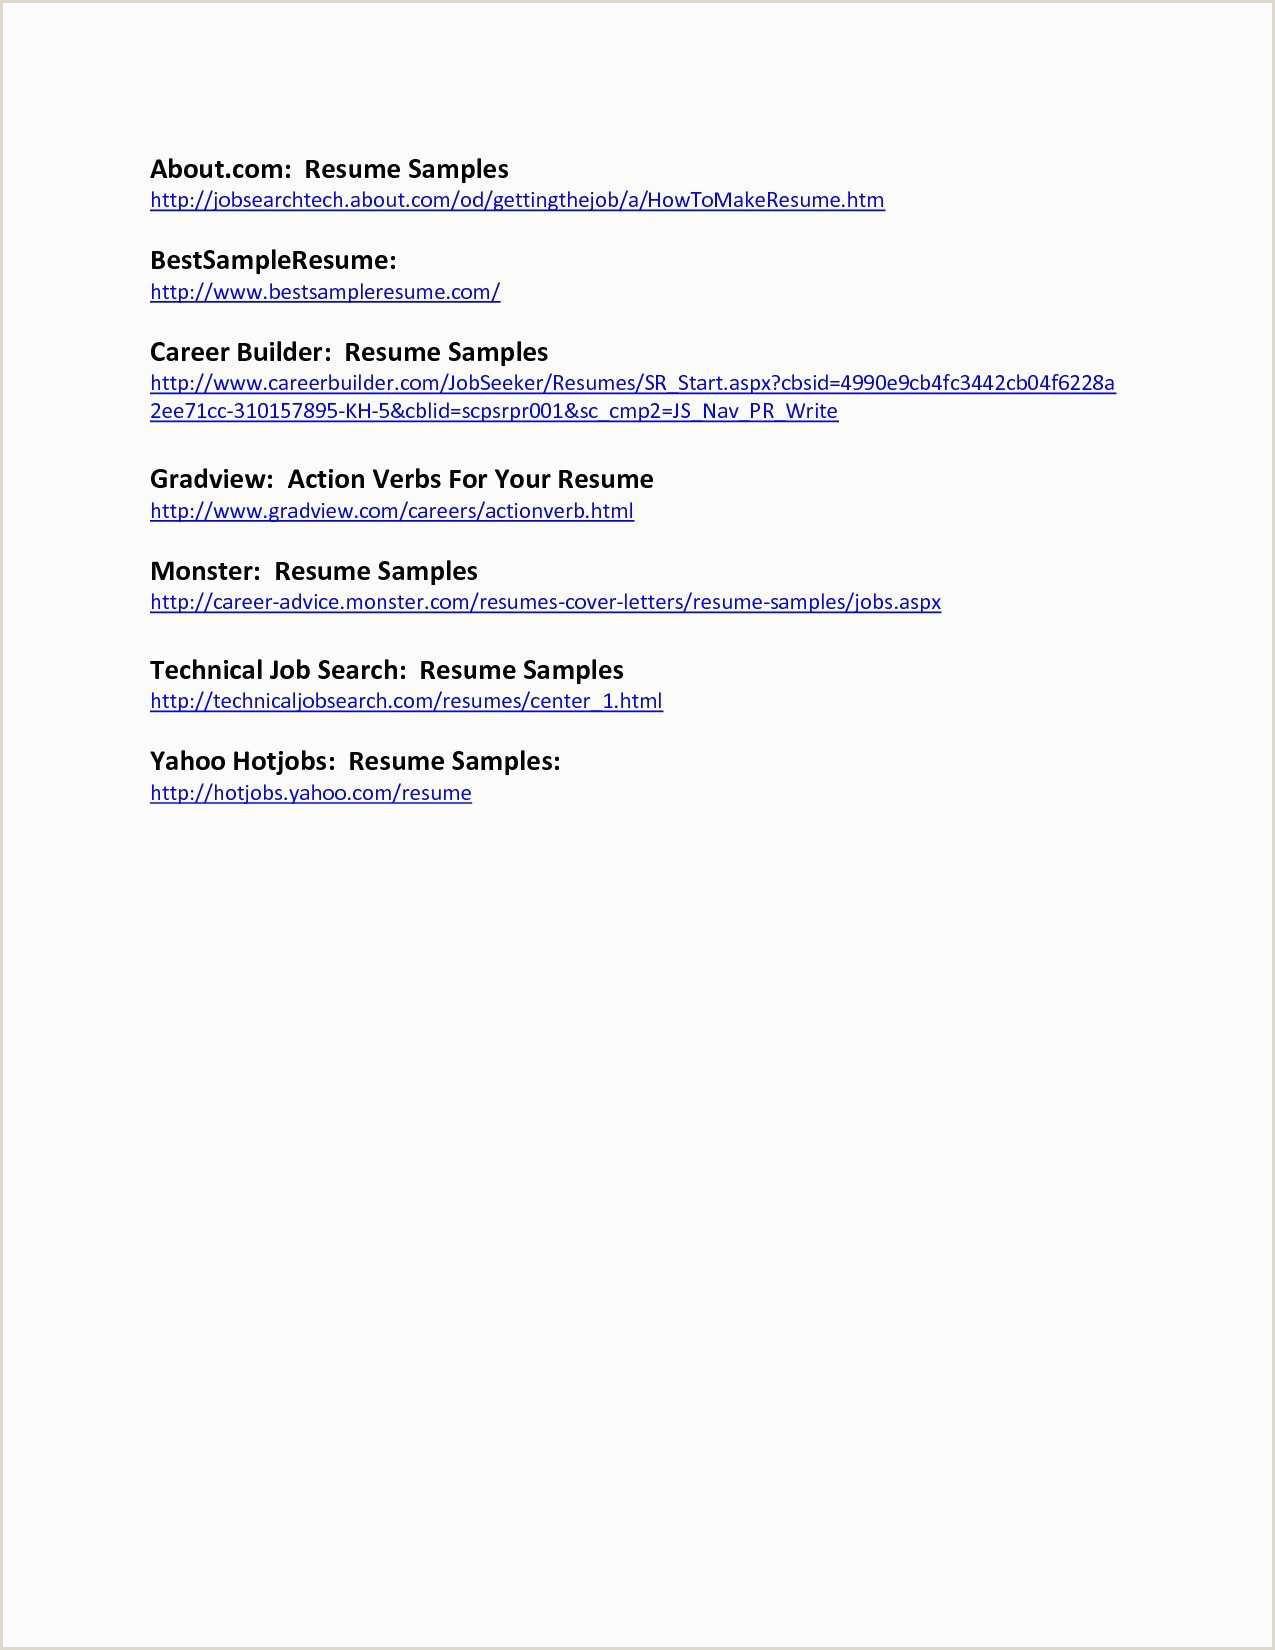 Professional Cv format Doc Cv Modele Word Gratuit Frais Curriculum Vitae Template Word